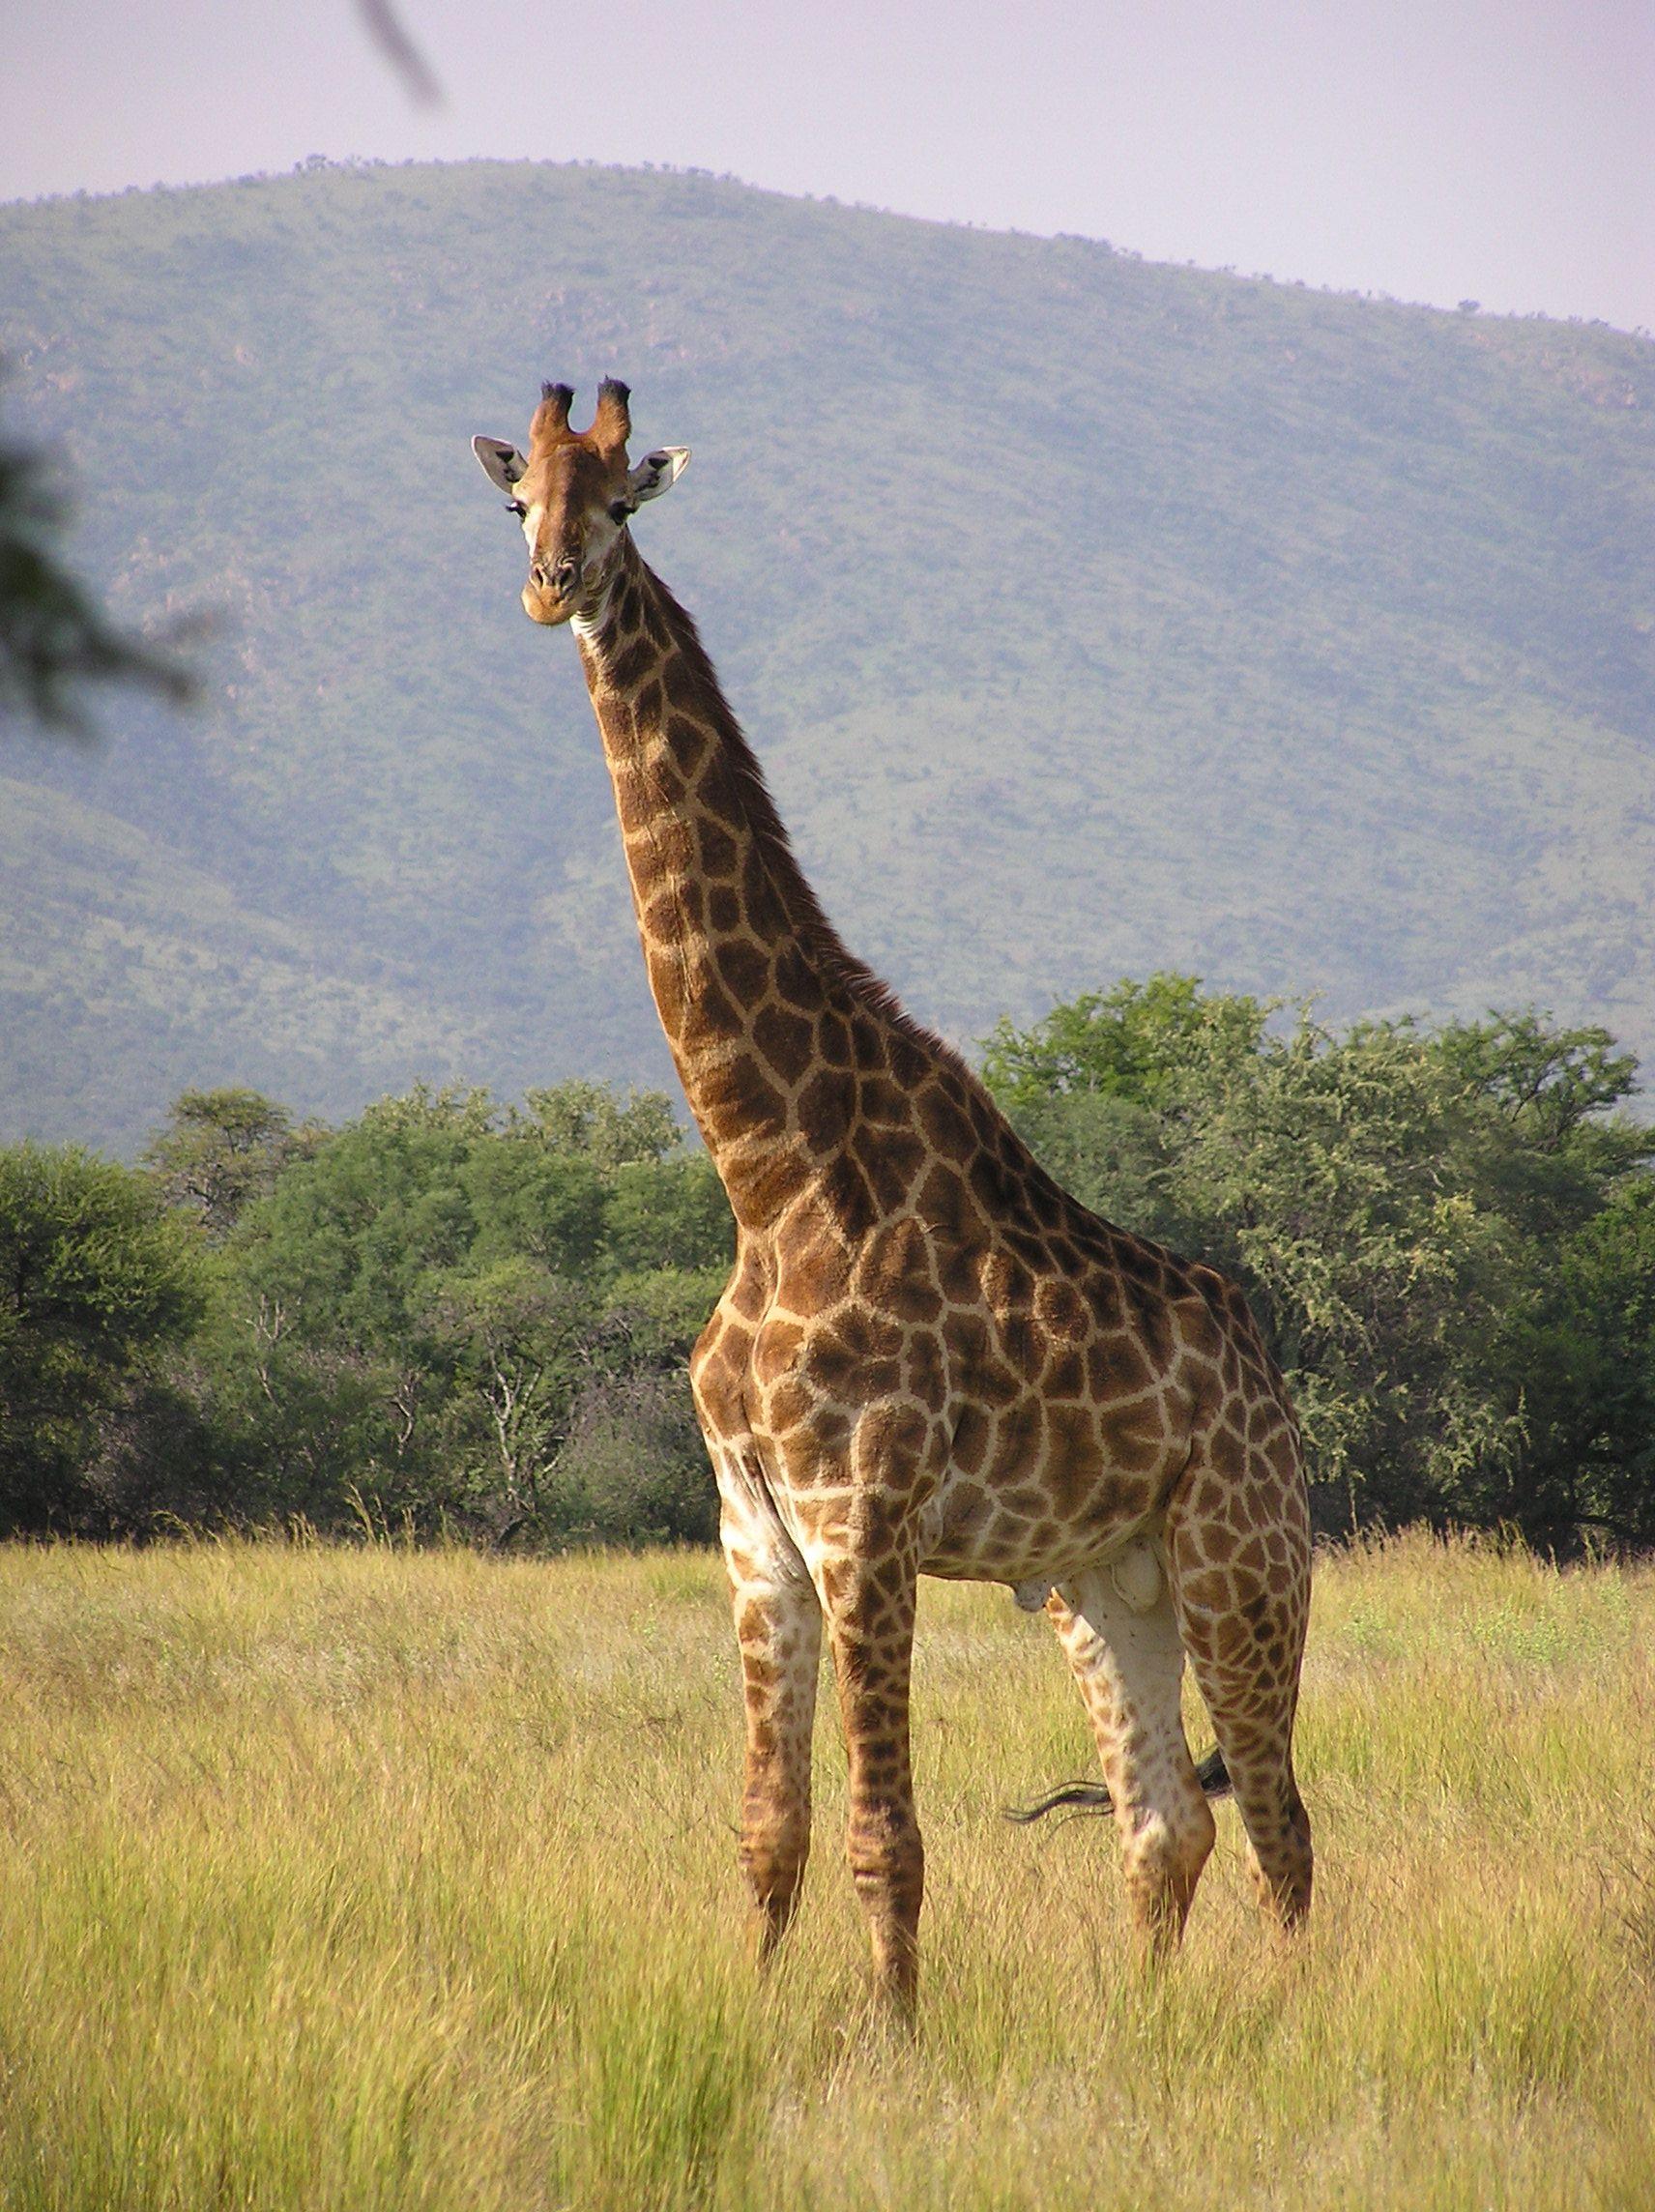 Beliebt Girafe | Animaux | Pinterest | Girafes, Buissons épineux et Savane  EZ76